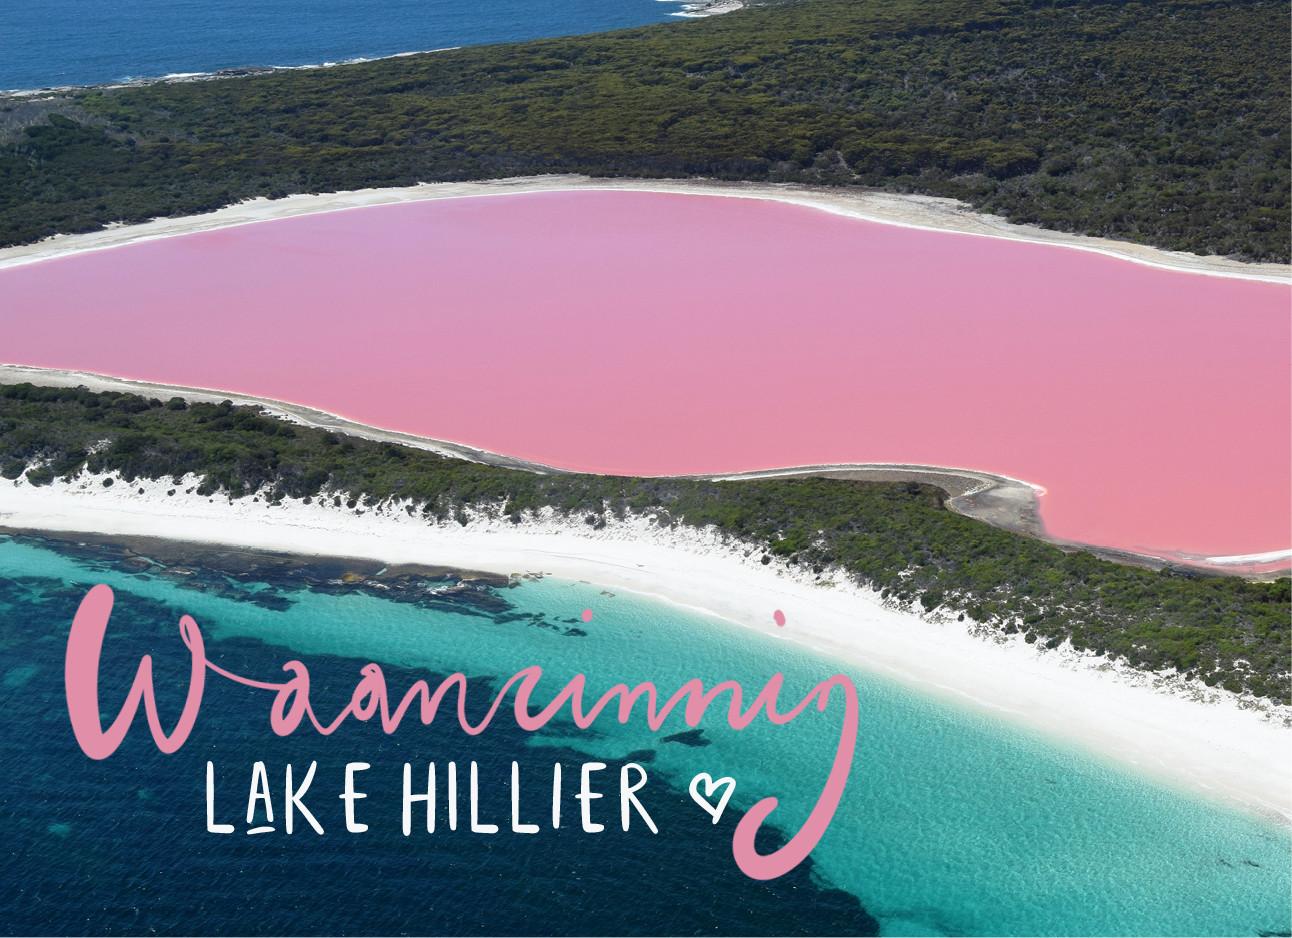 lake hillier